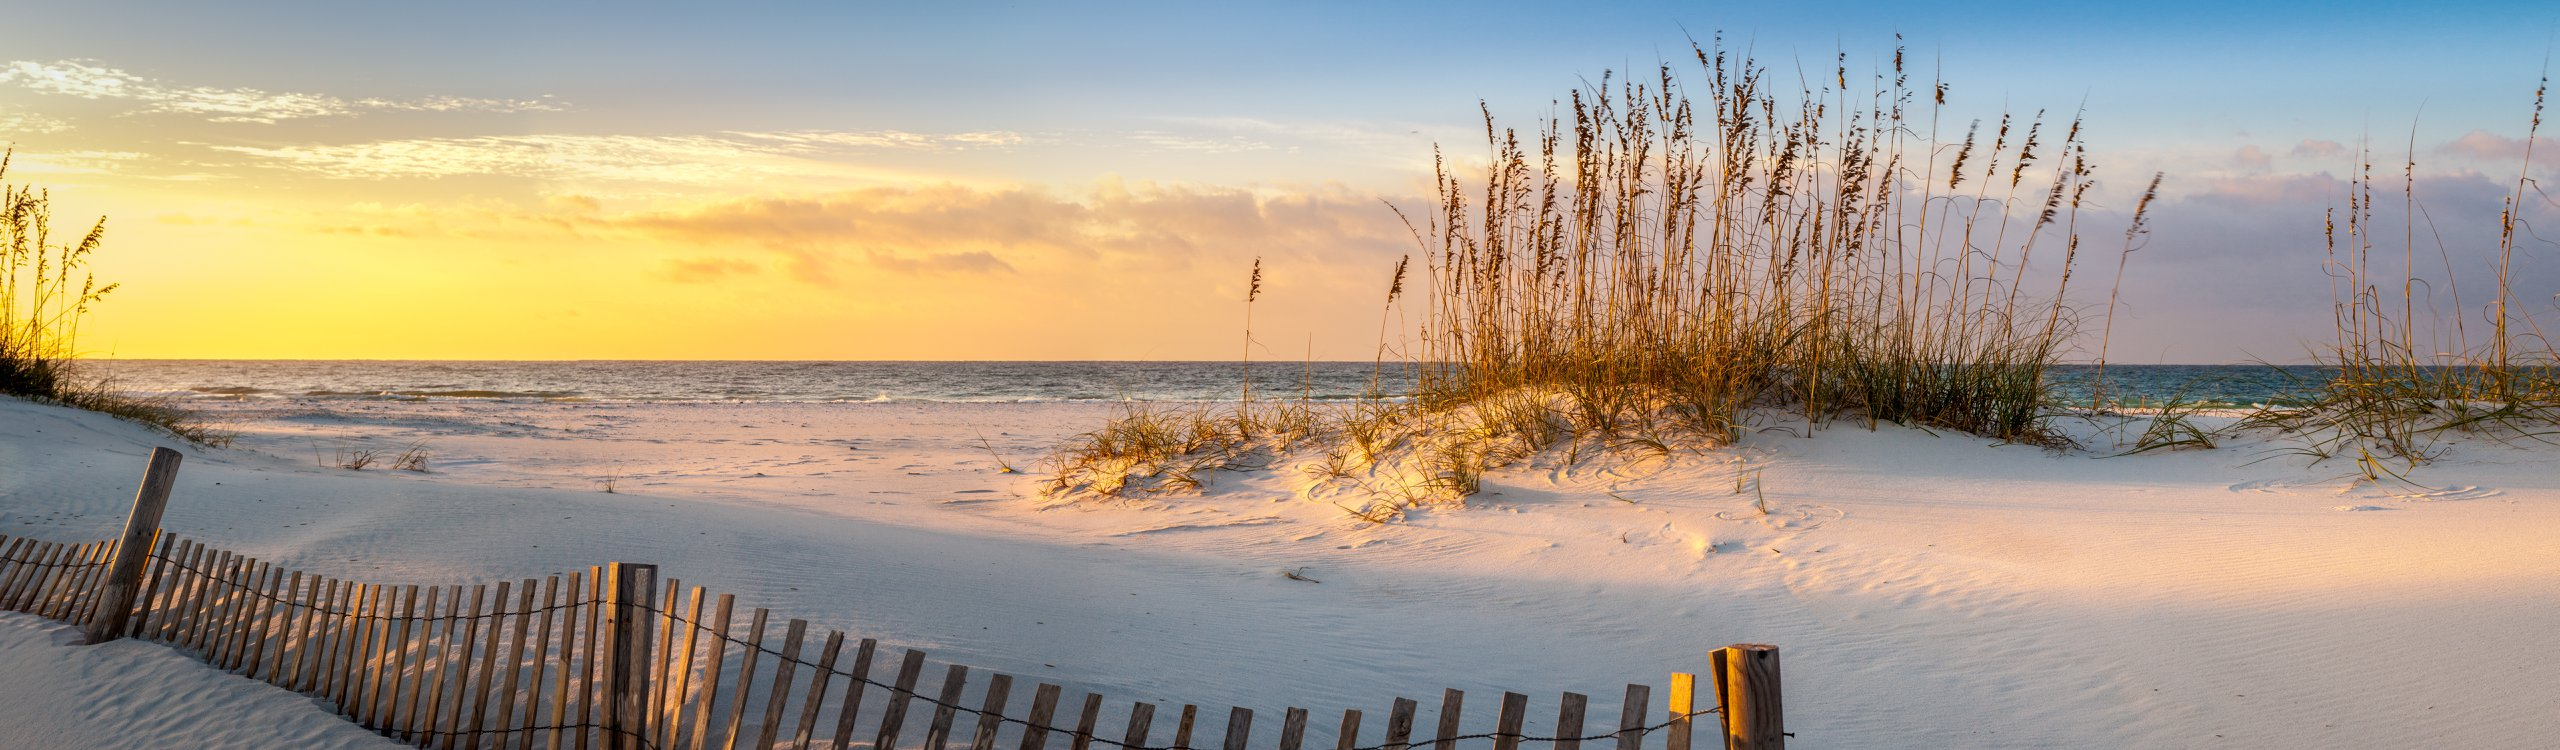 Forever Destin Beach Rentals Florida Emerald Coast Beaches